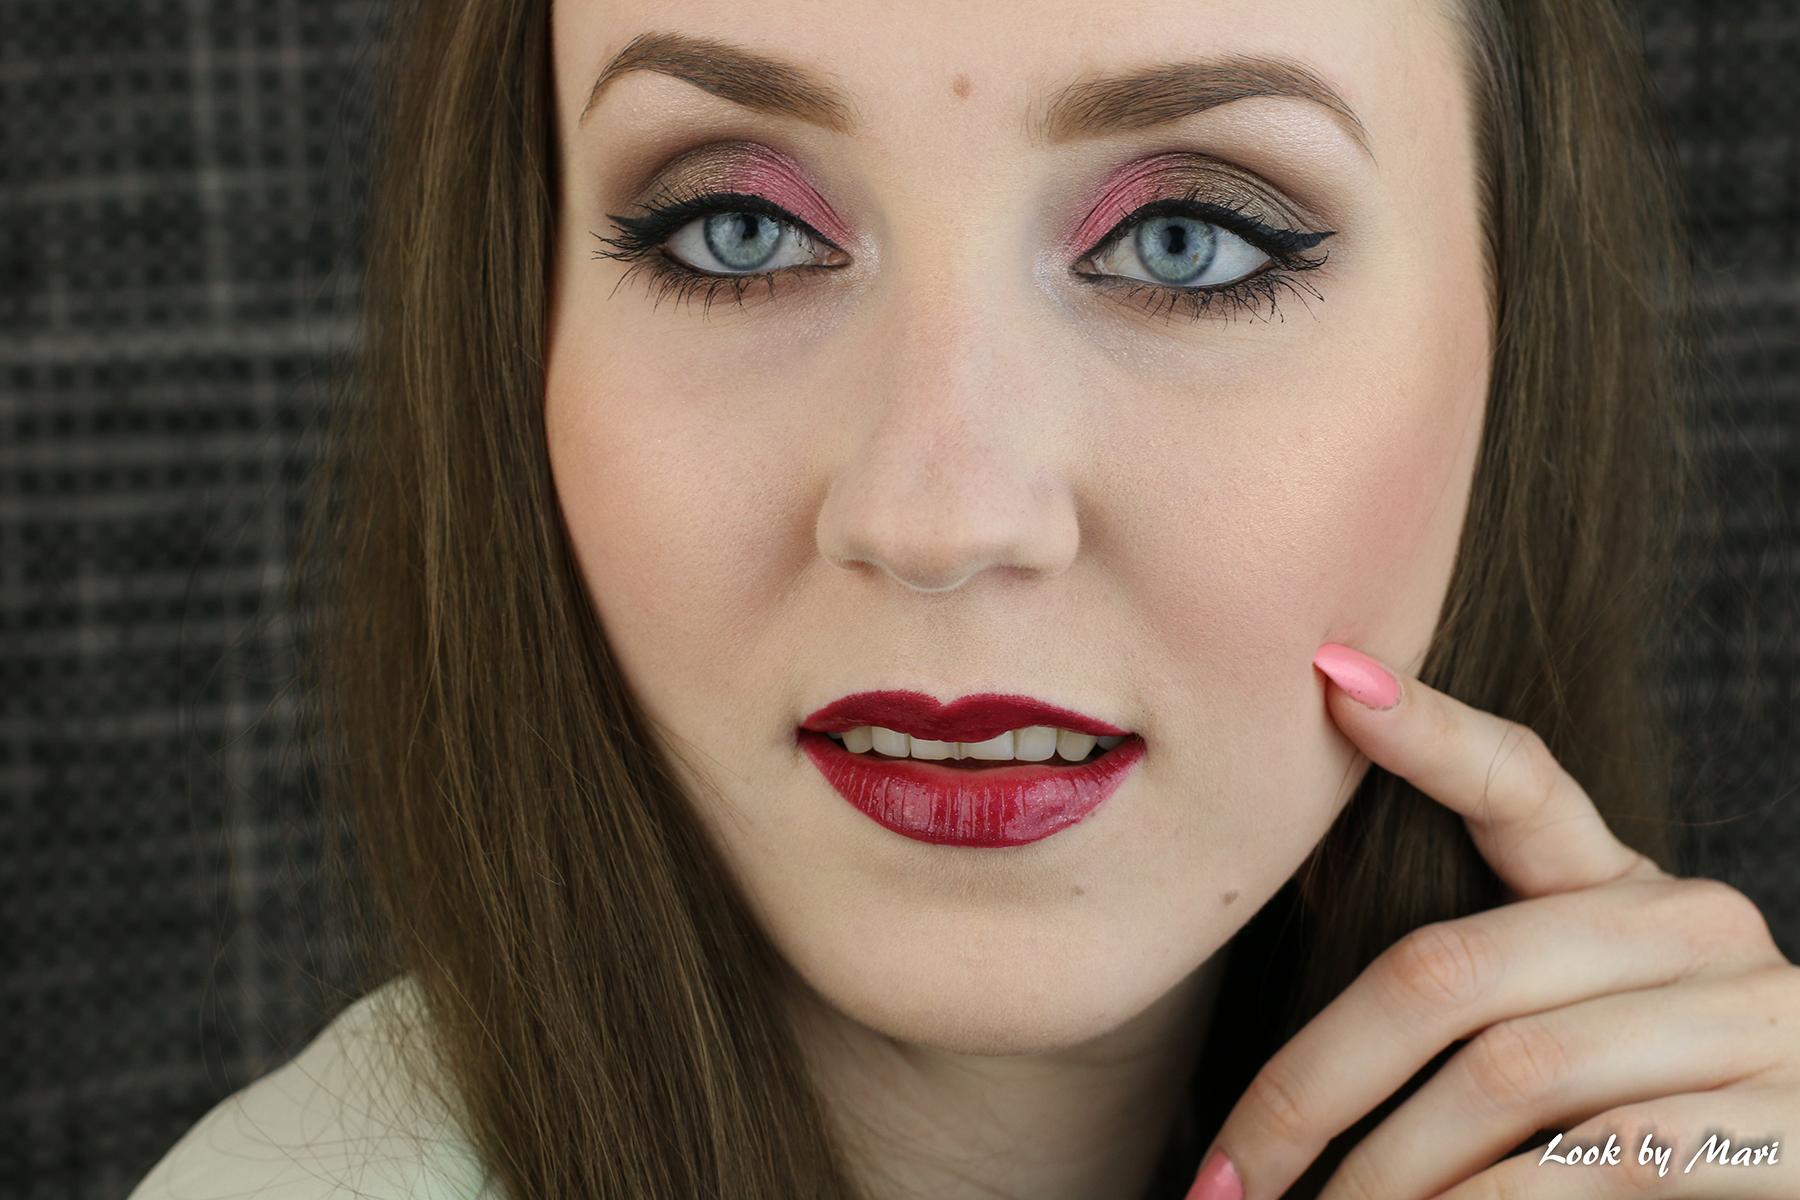 5 maybelline the 24karat nudes eyeshadow paletti review swatches makeup kokemuksia luomiväripaletti